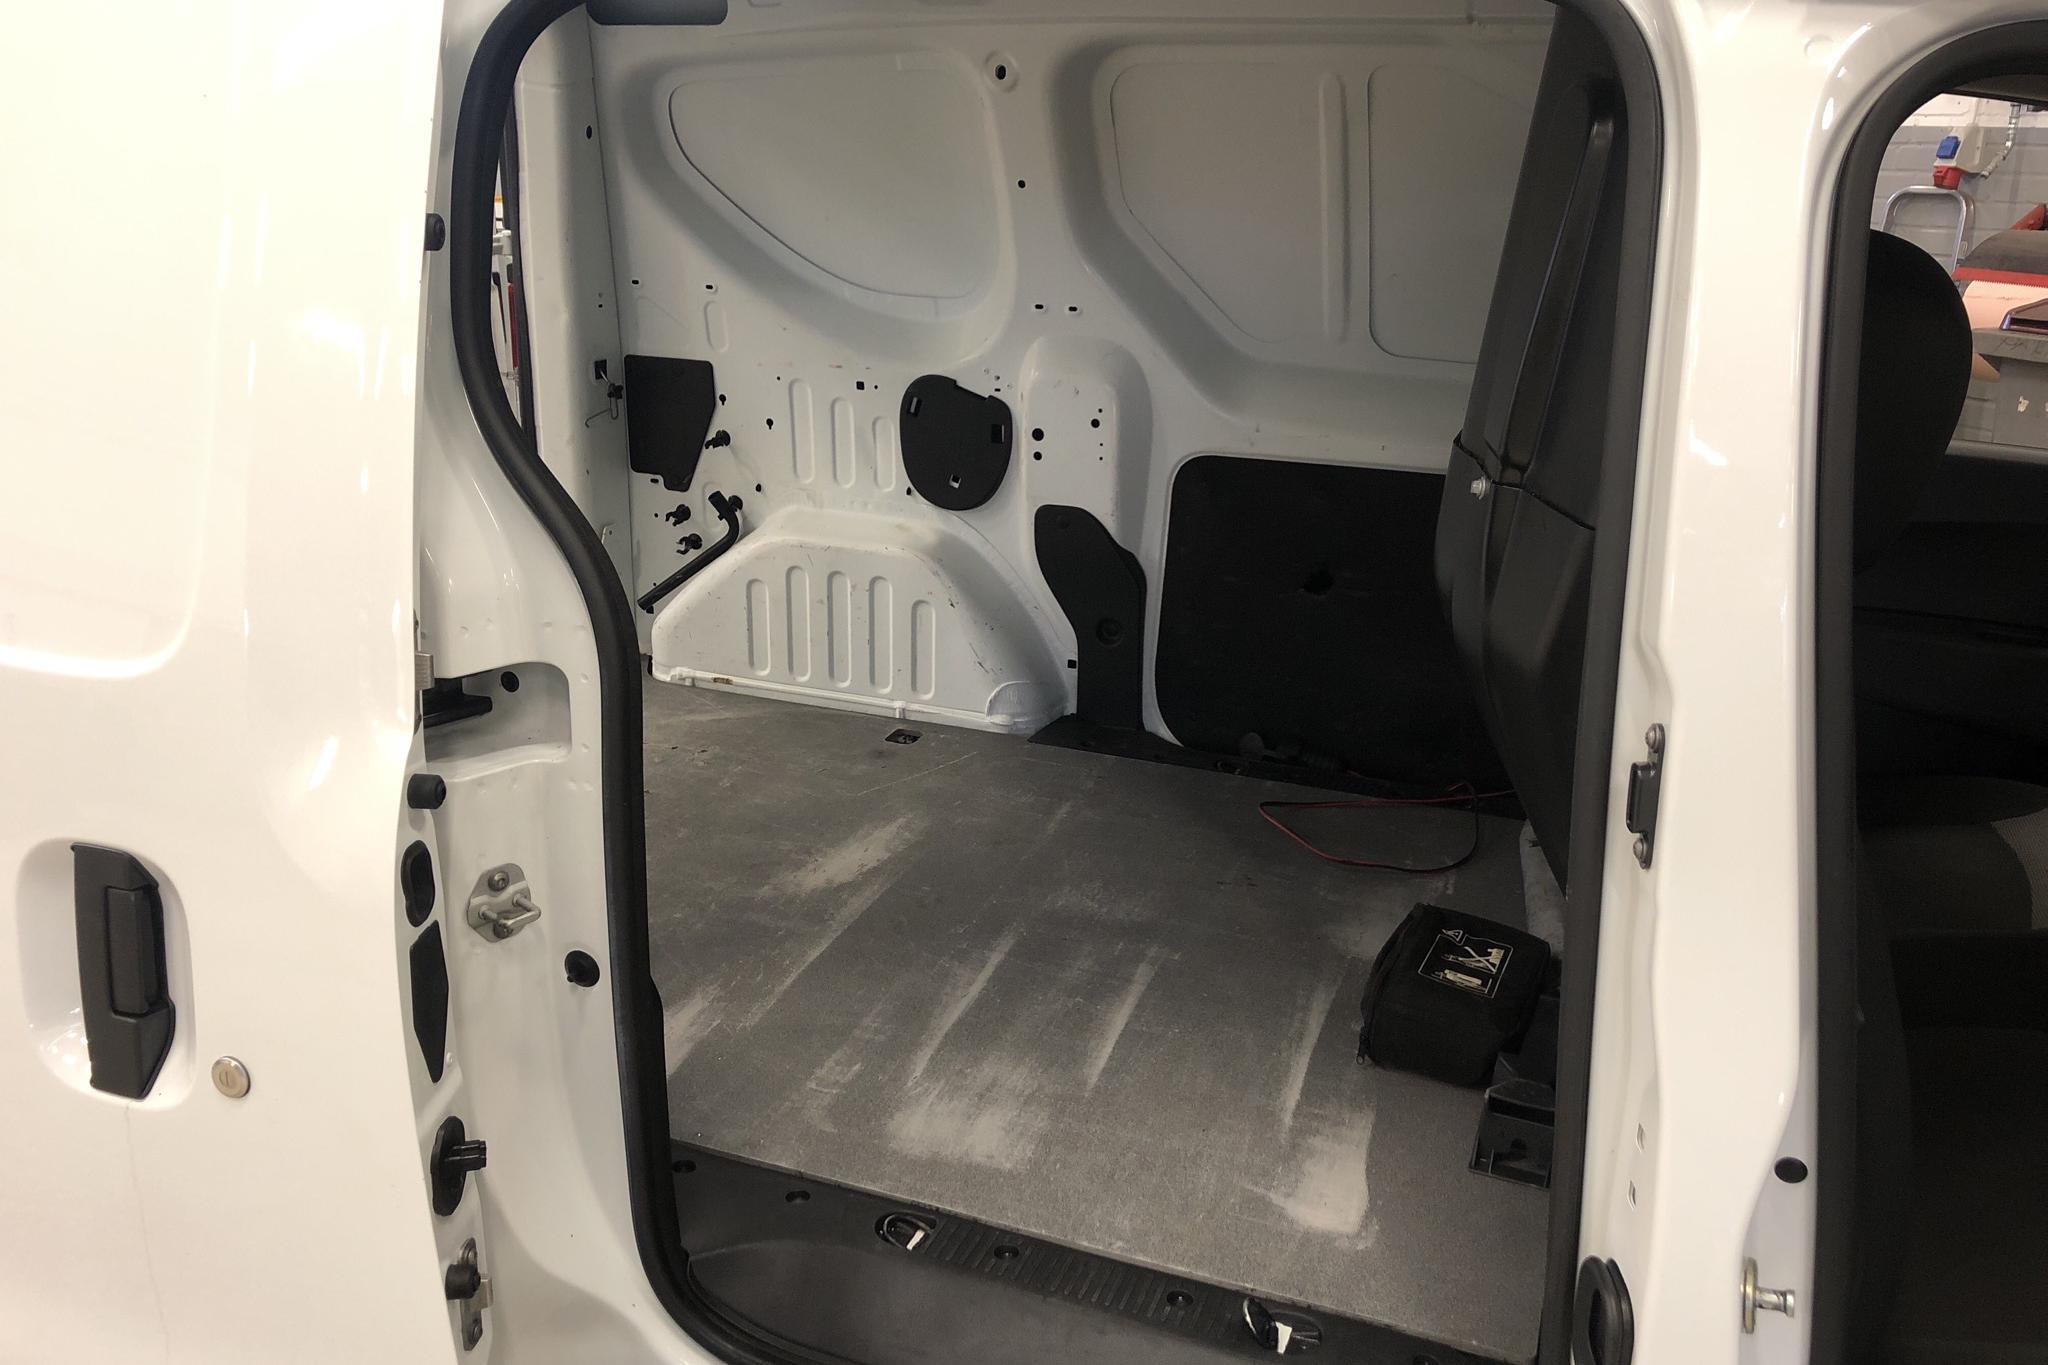 Dacia Dokker Van 1.5 dCi (90hk) - 58 640 km - Manual - white - 2018